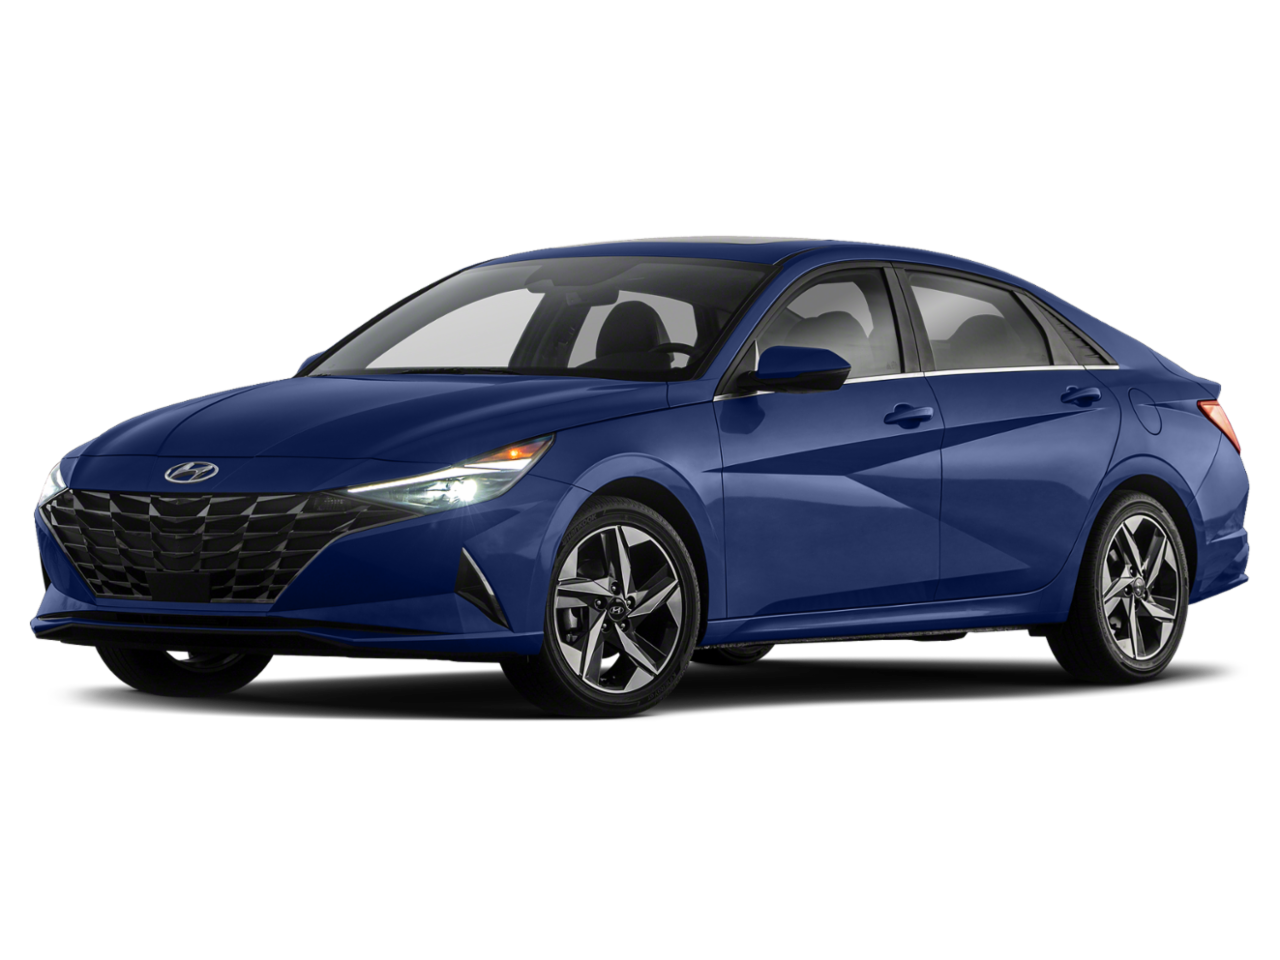 Hyundai 2021 Elantra Hybrid Blue